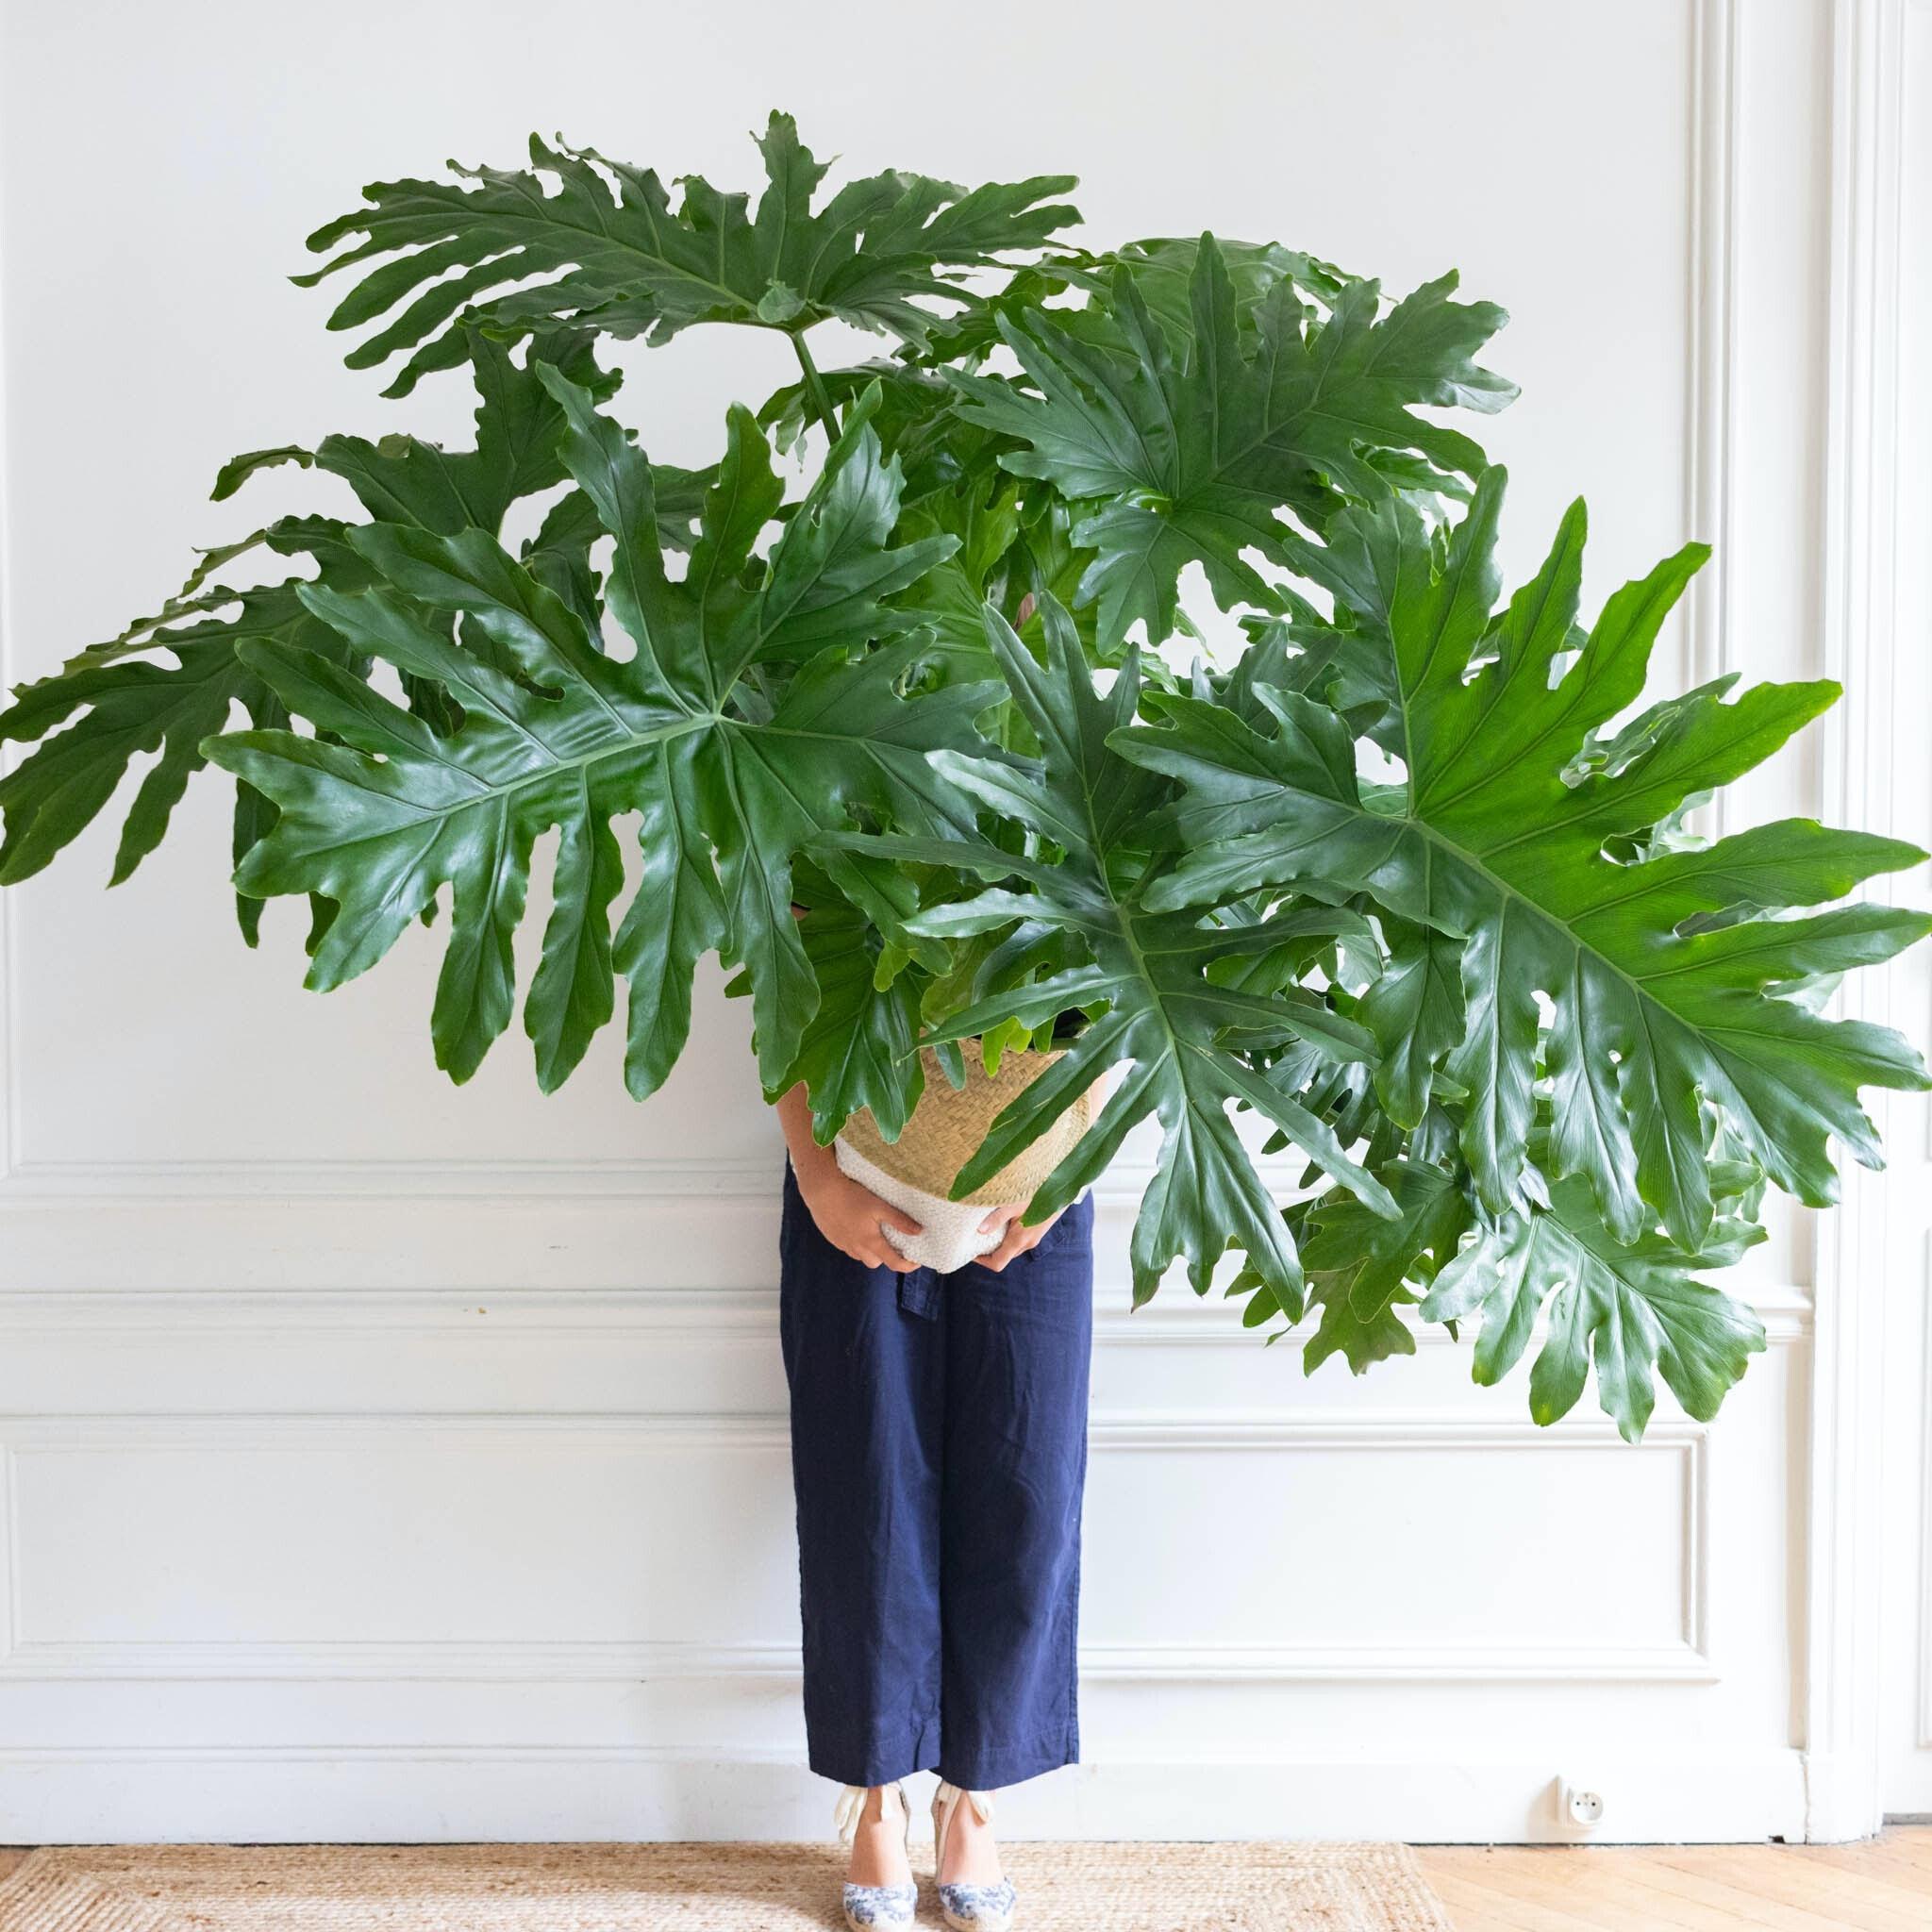 Philipp - Philodendron selloum